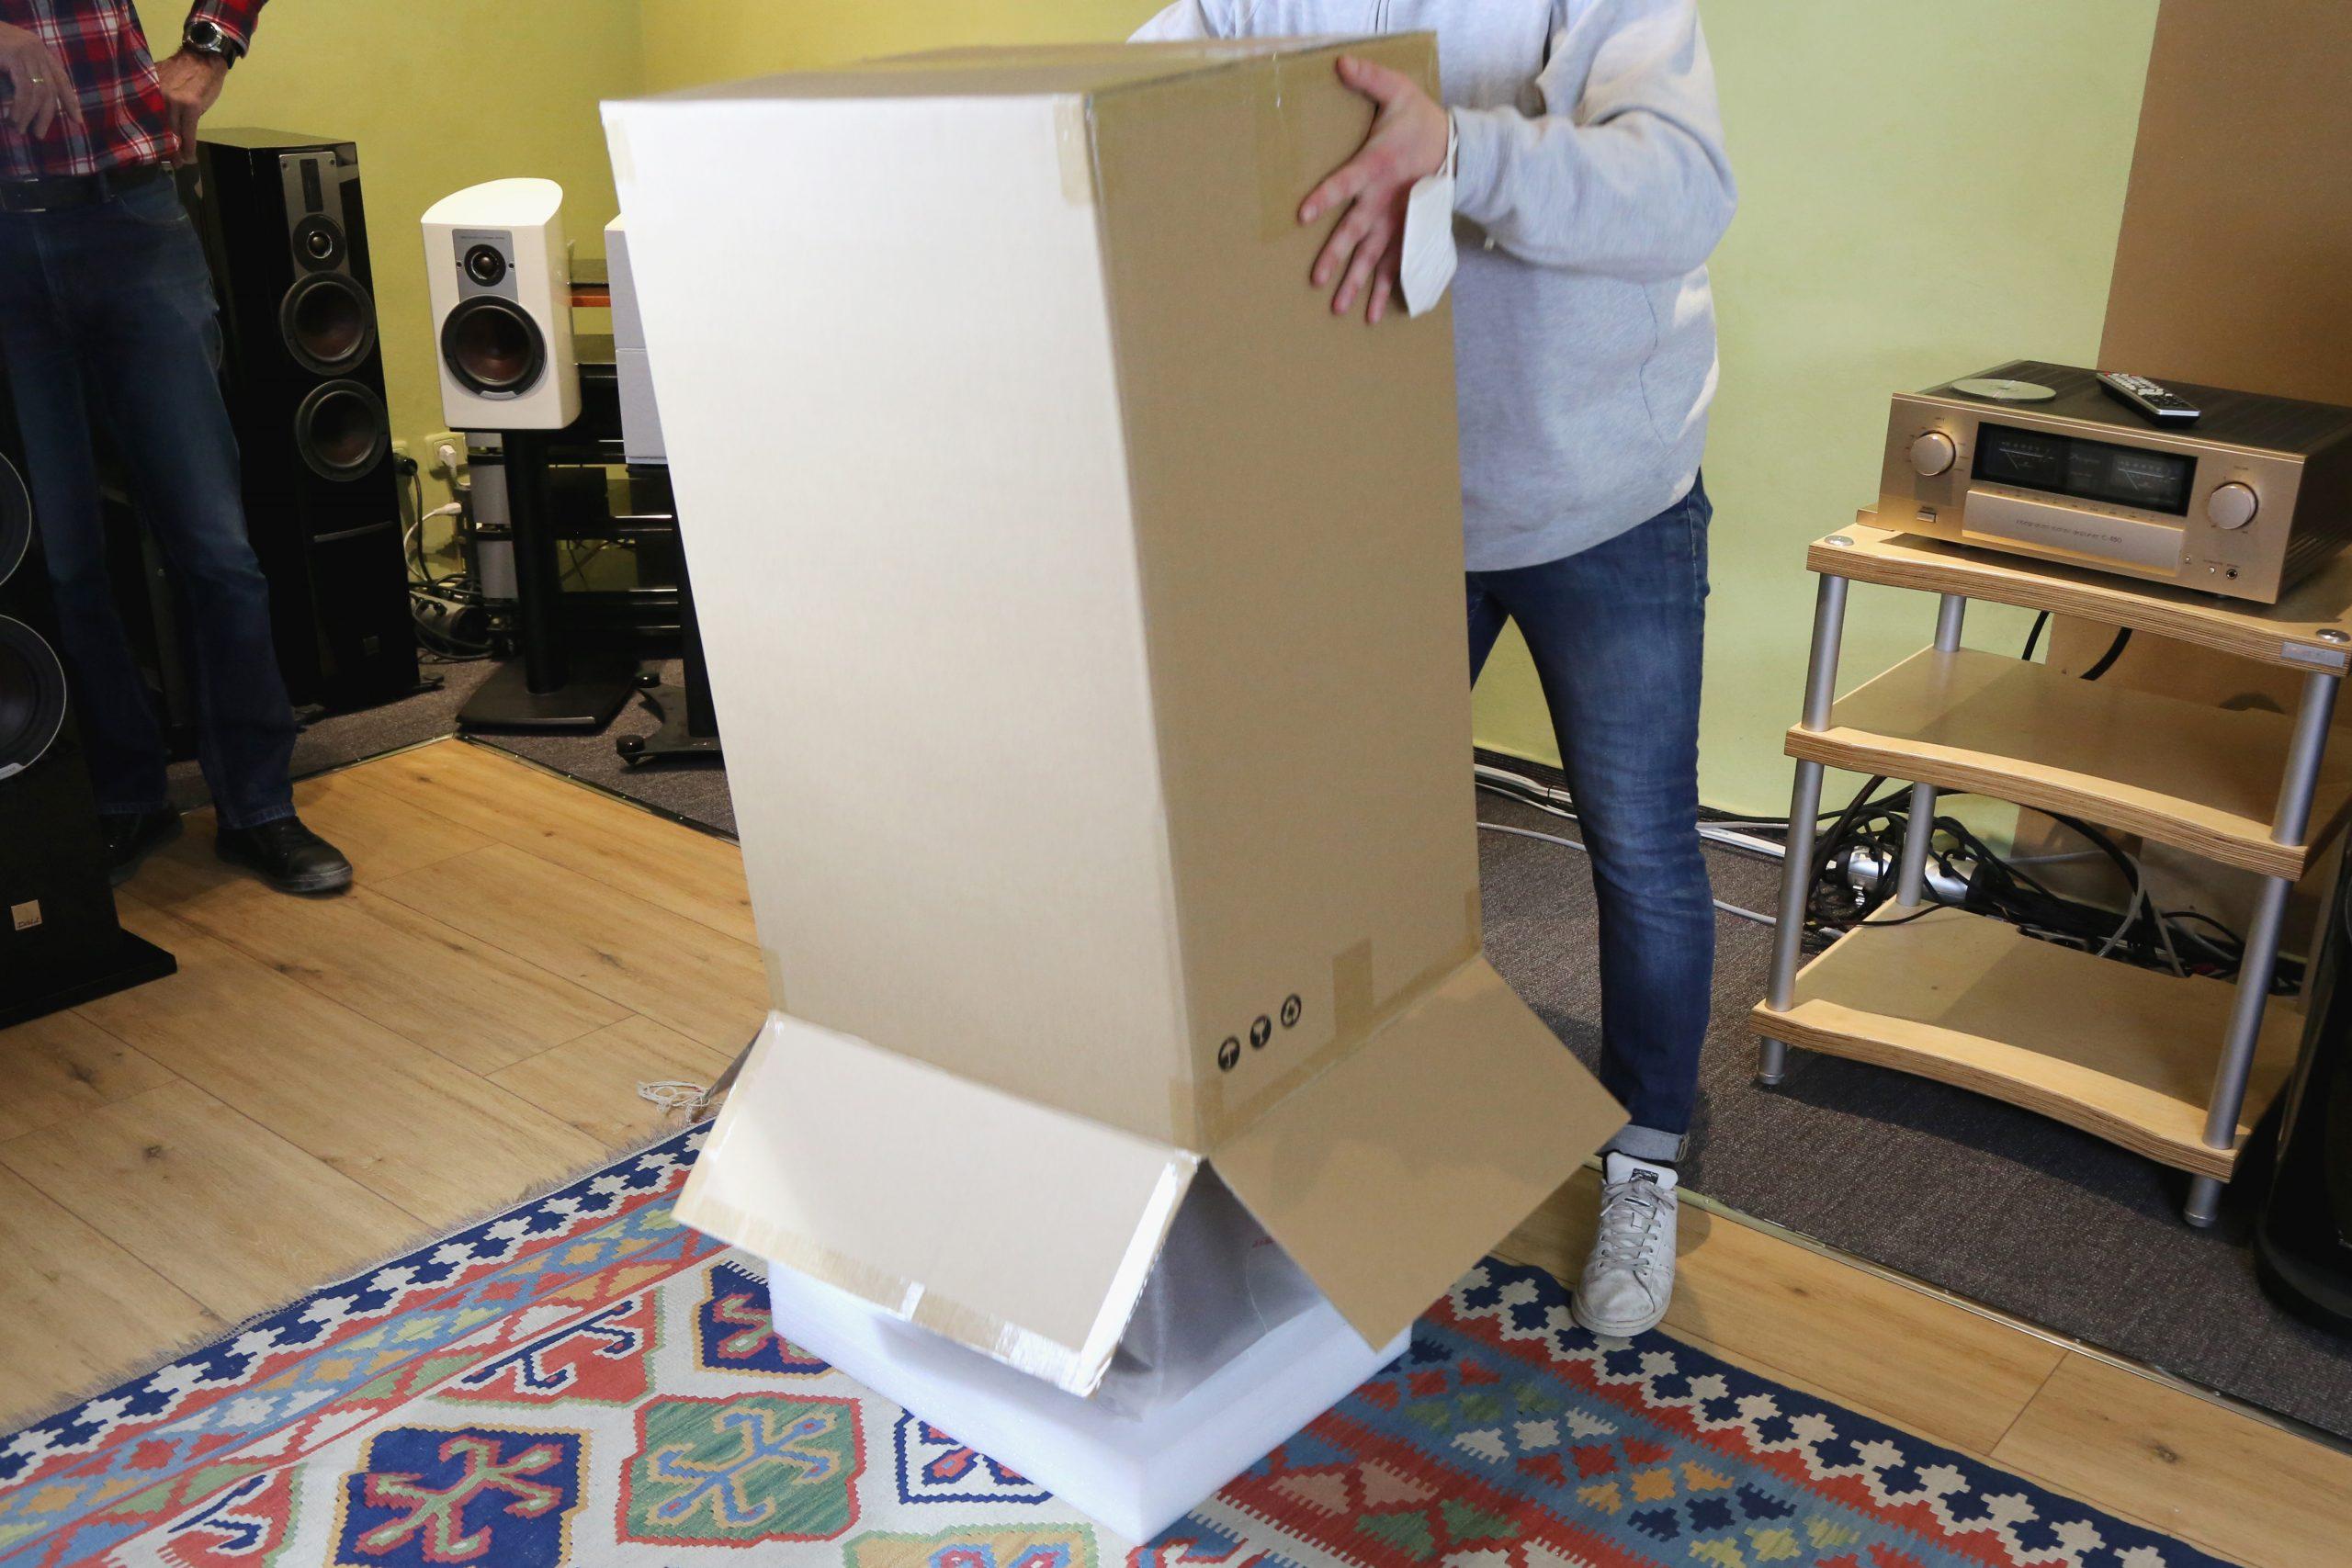 Auspacken der neuen JBL 4349 Lautsprecher